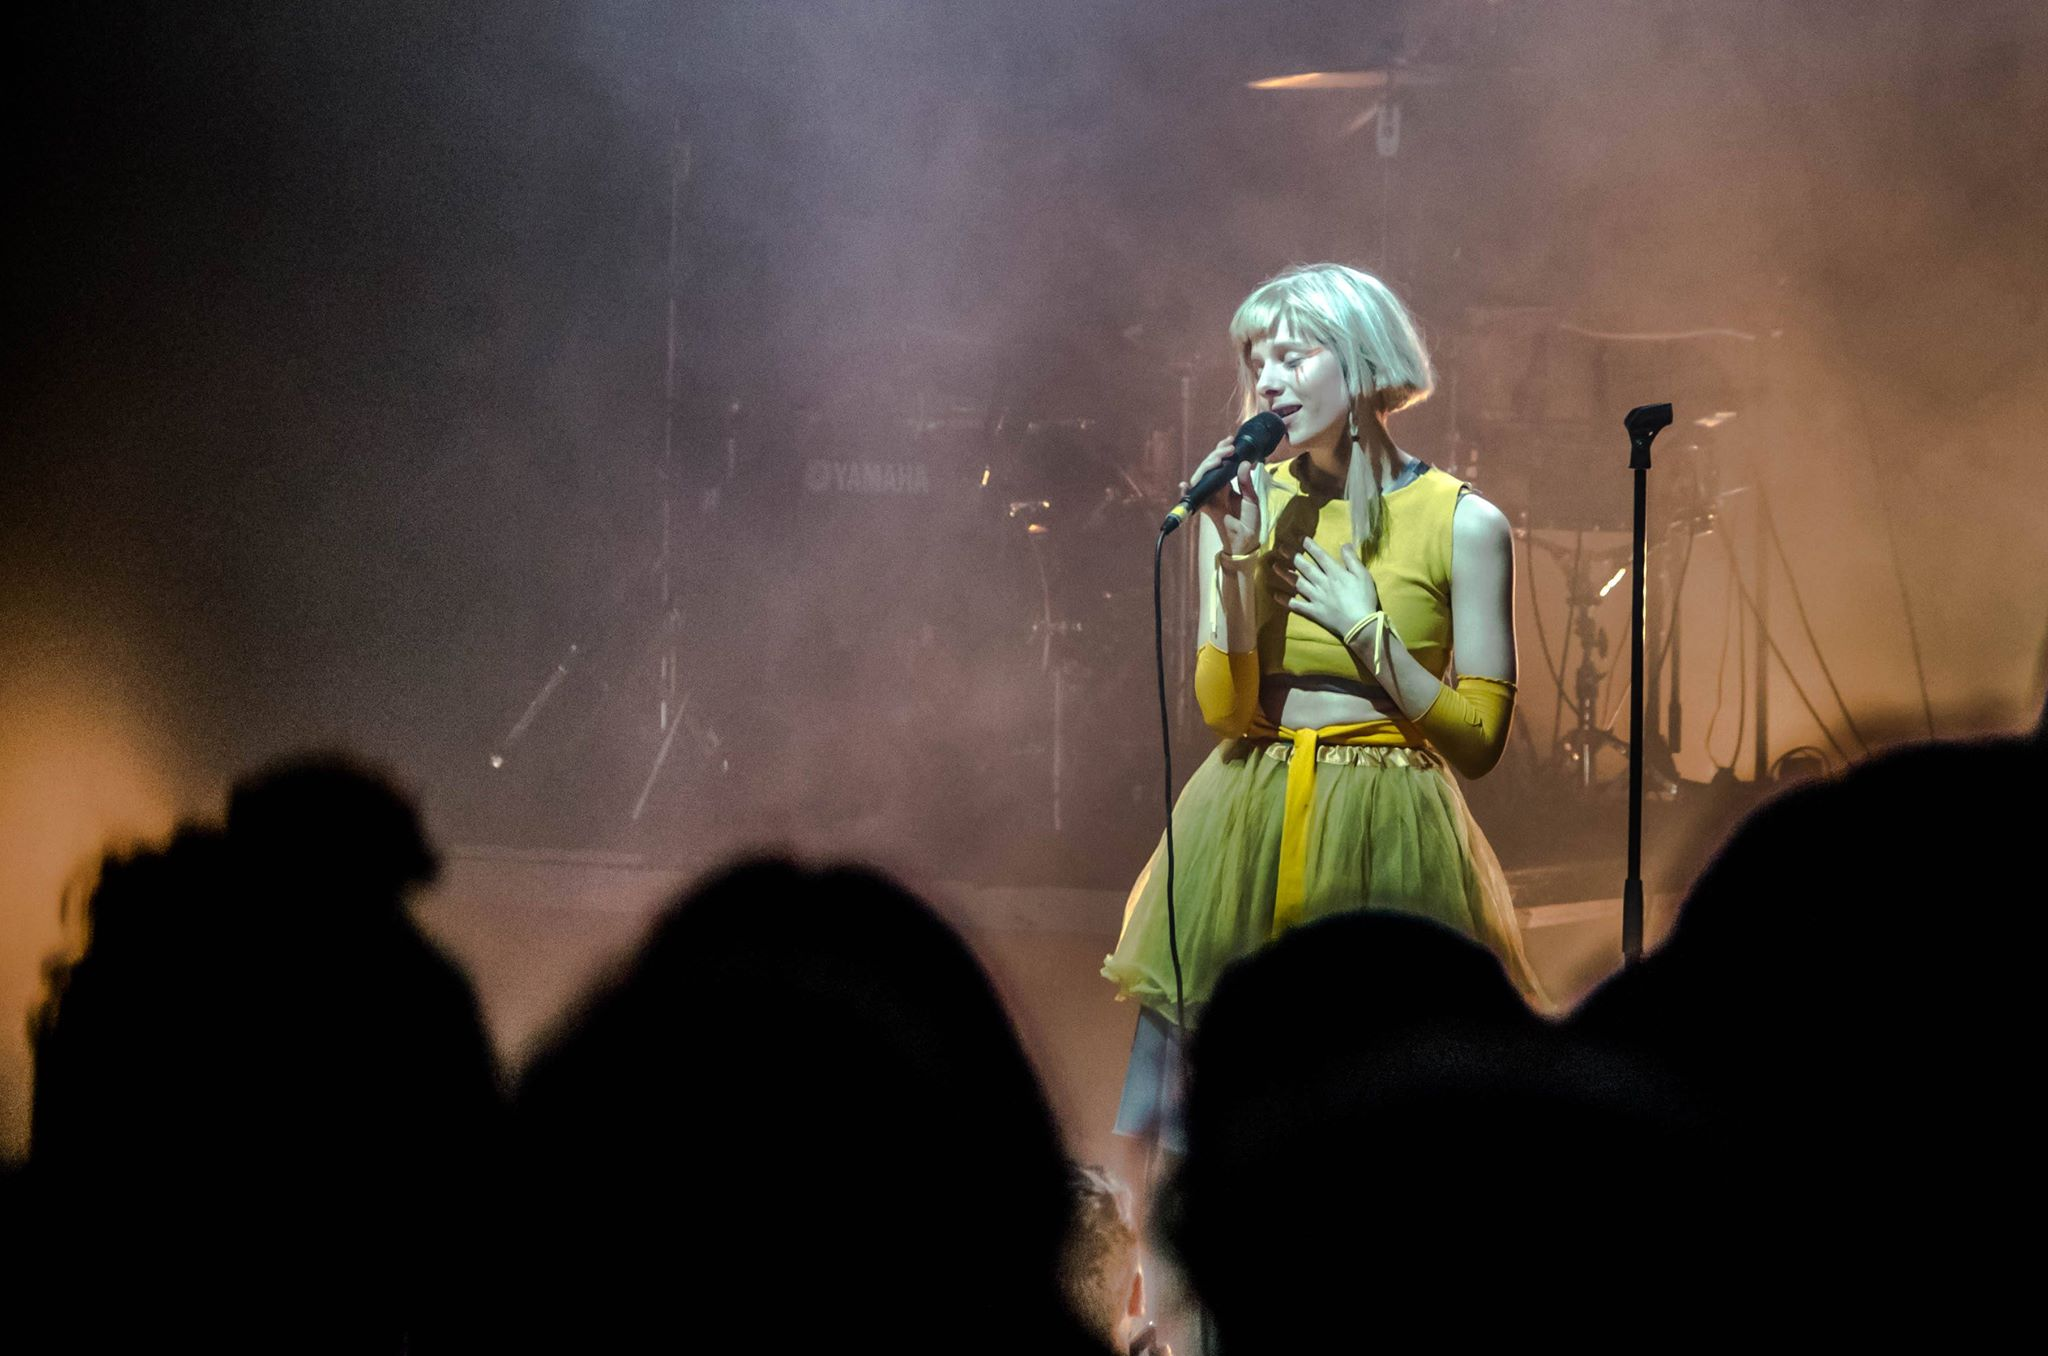 Aurora La cigale2018 ©Ludivine Pellissier